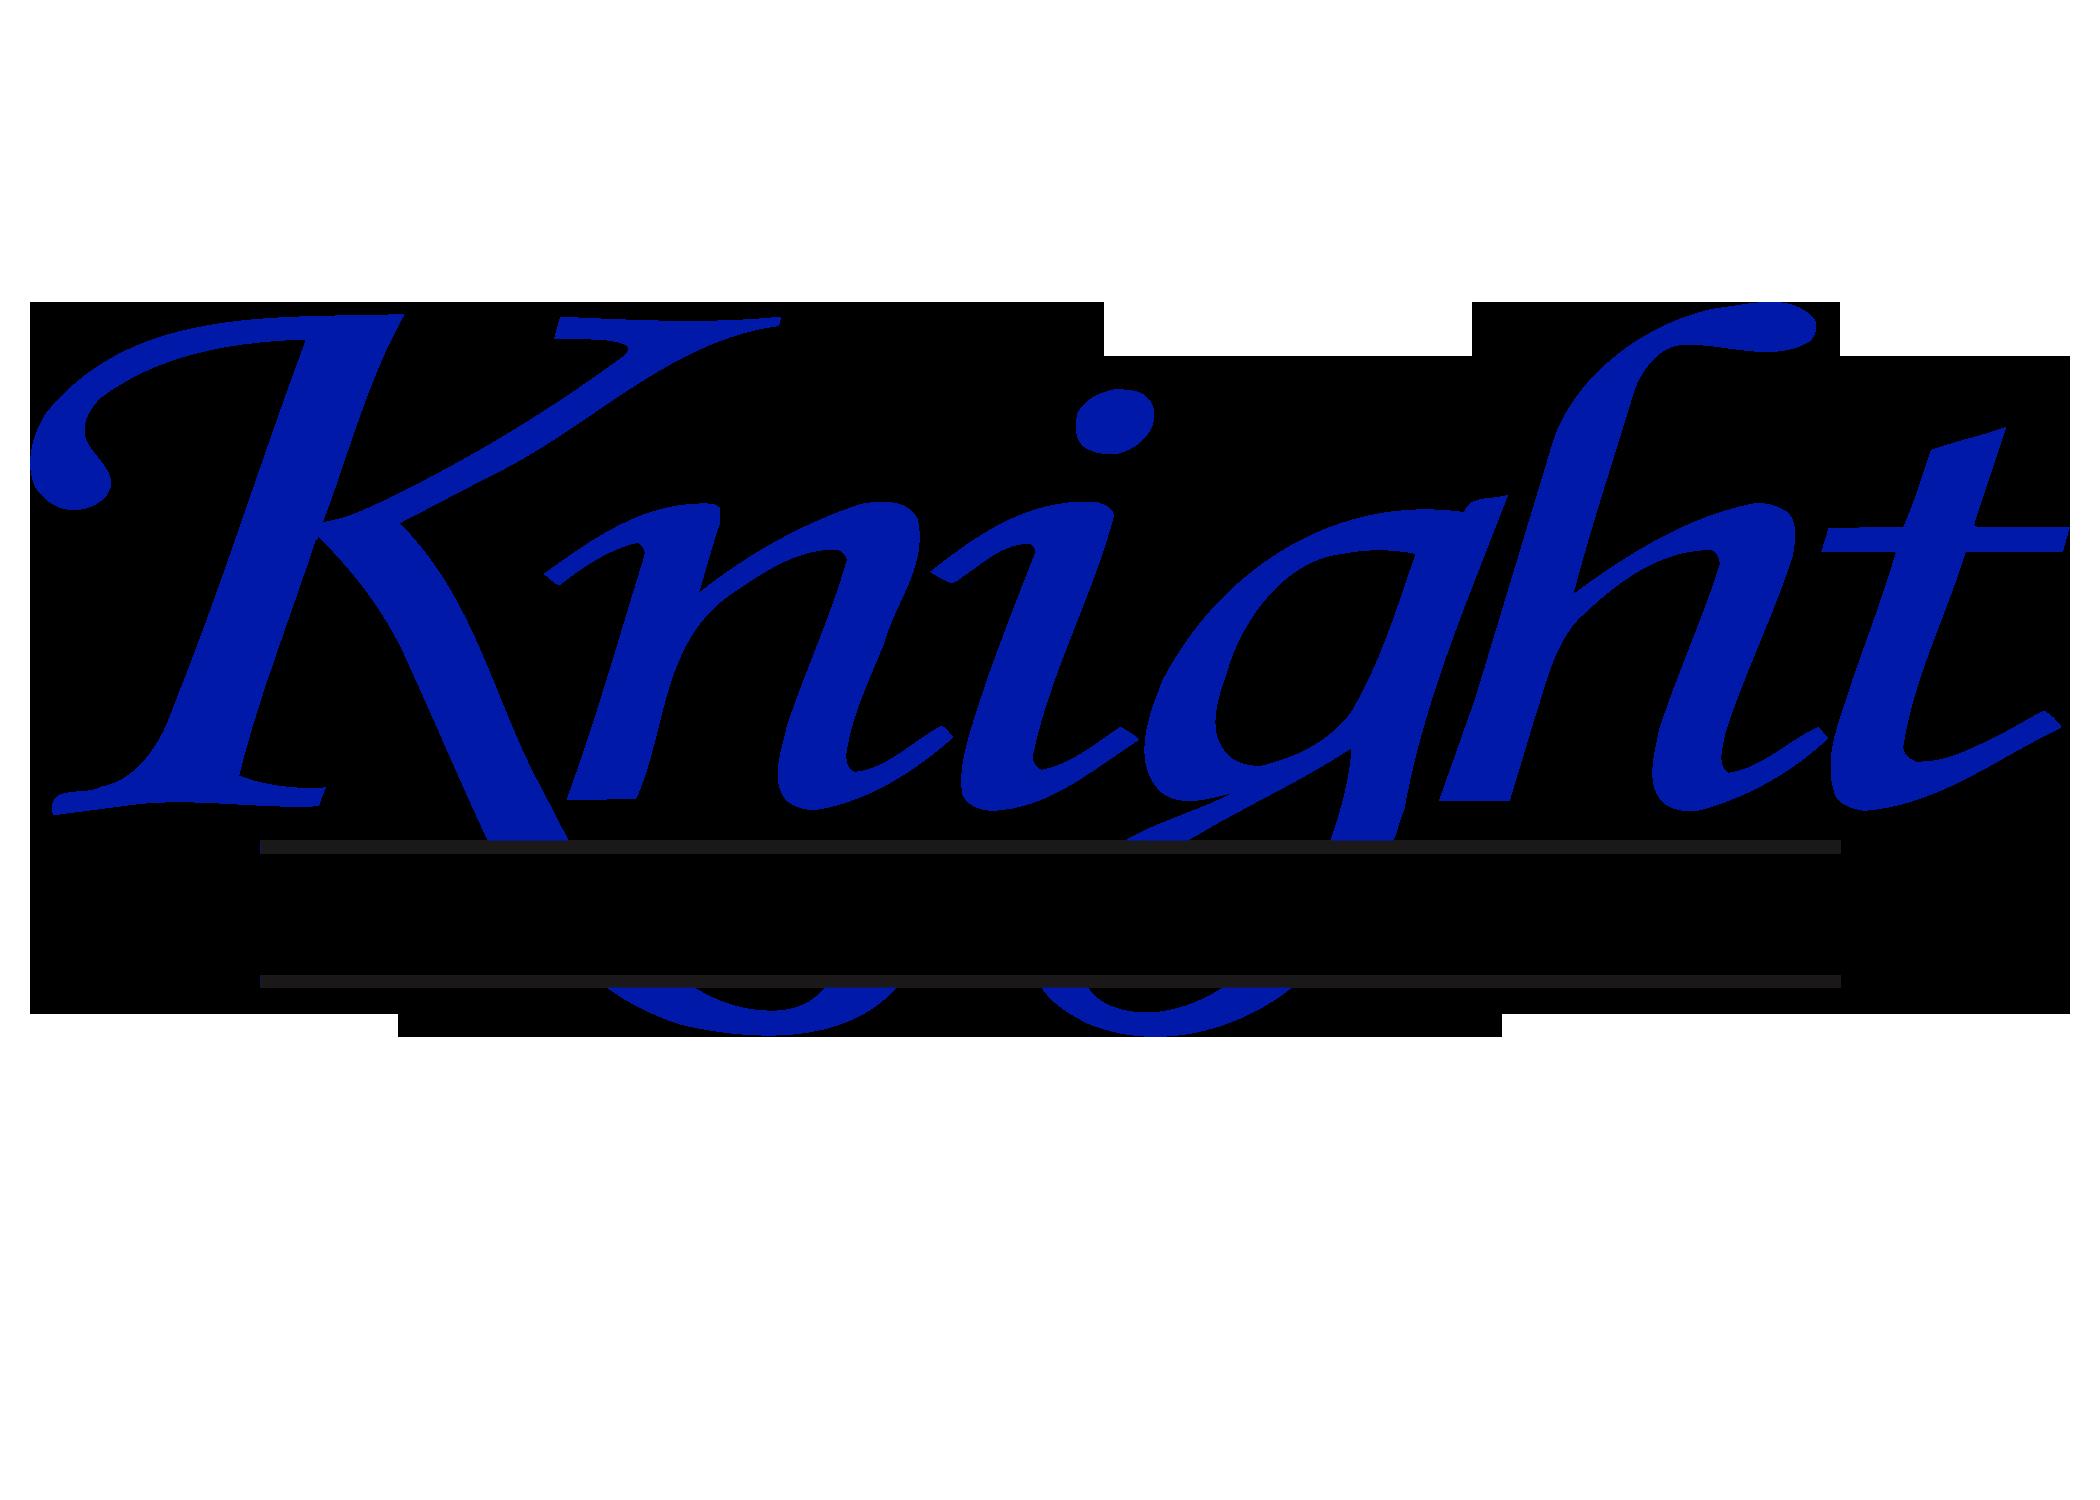 Knight Furniture and Mattress